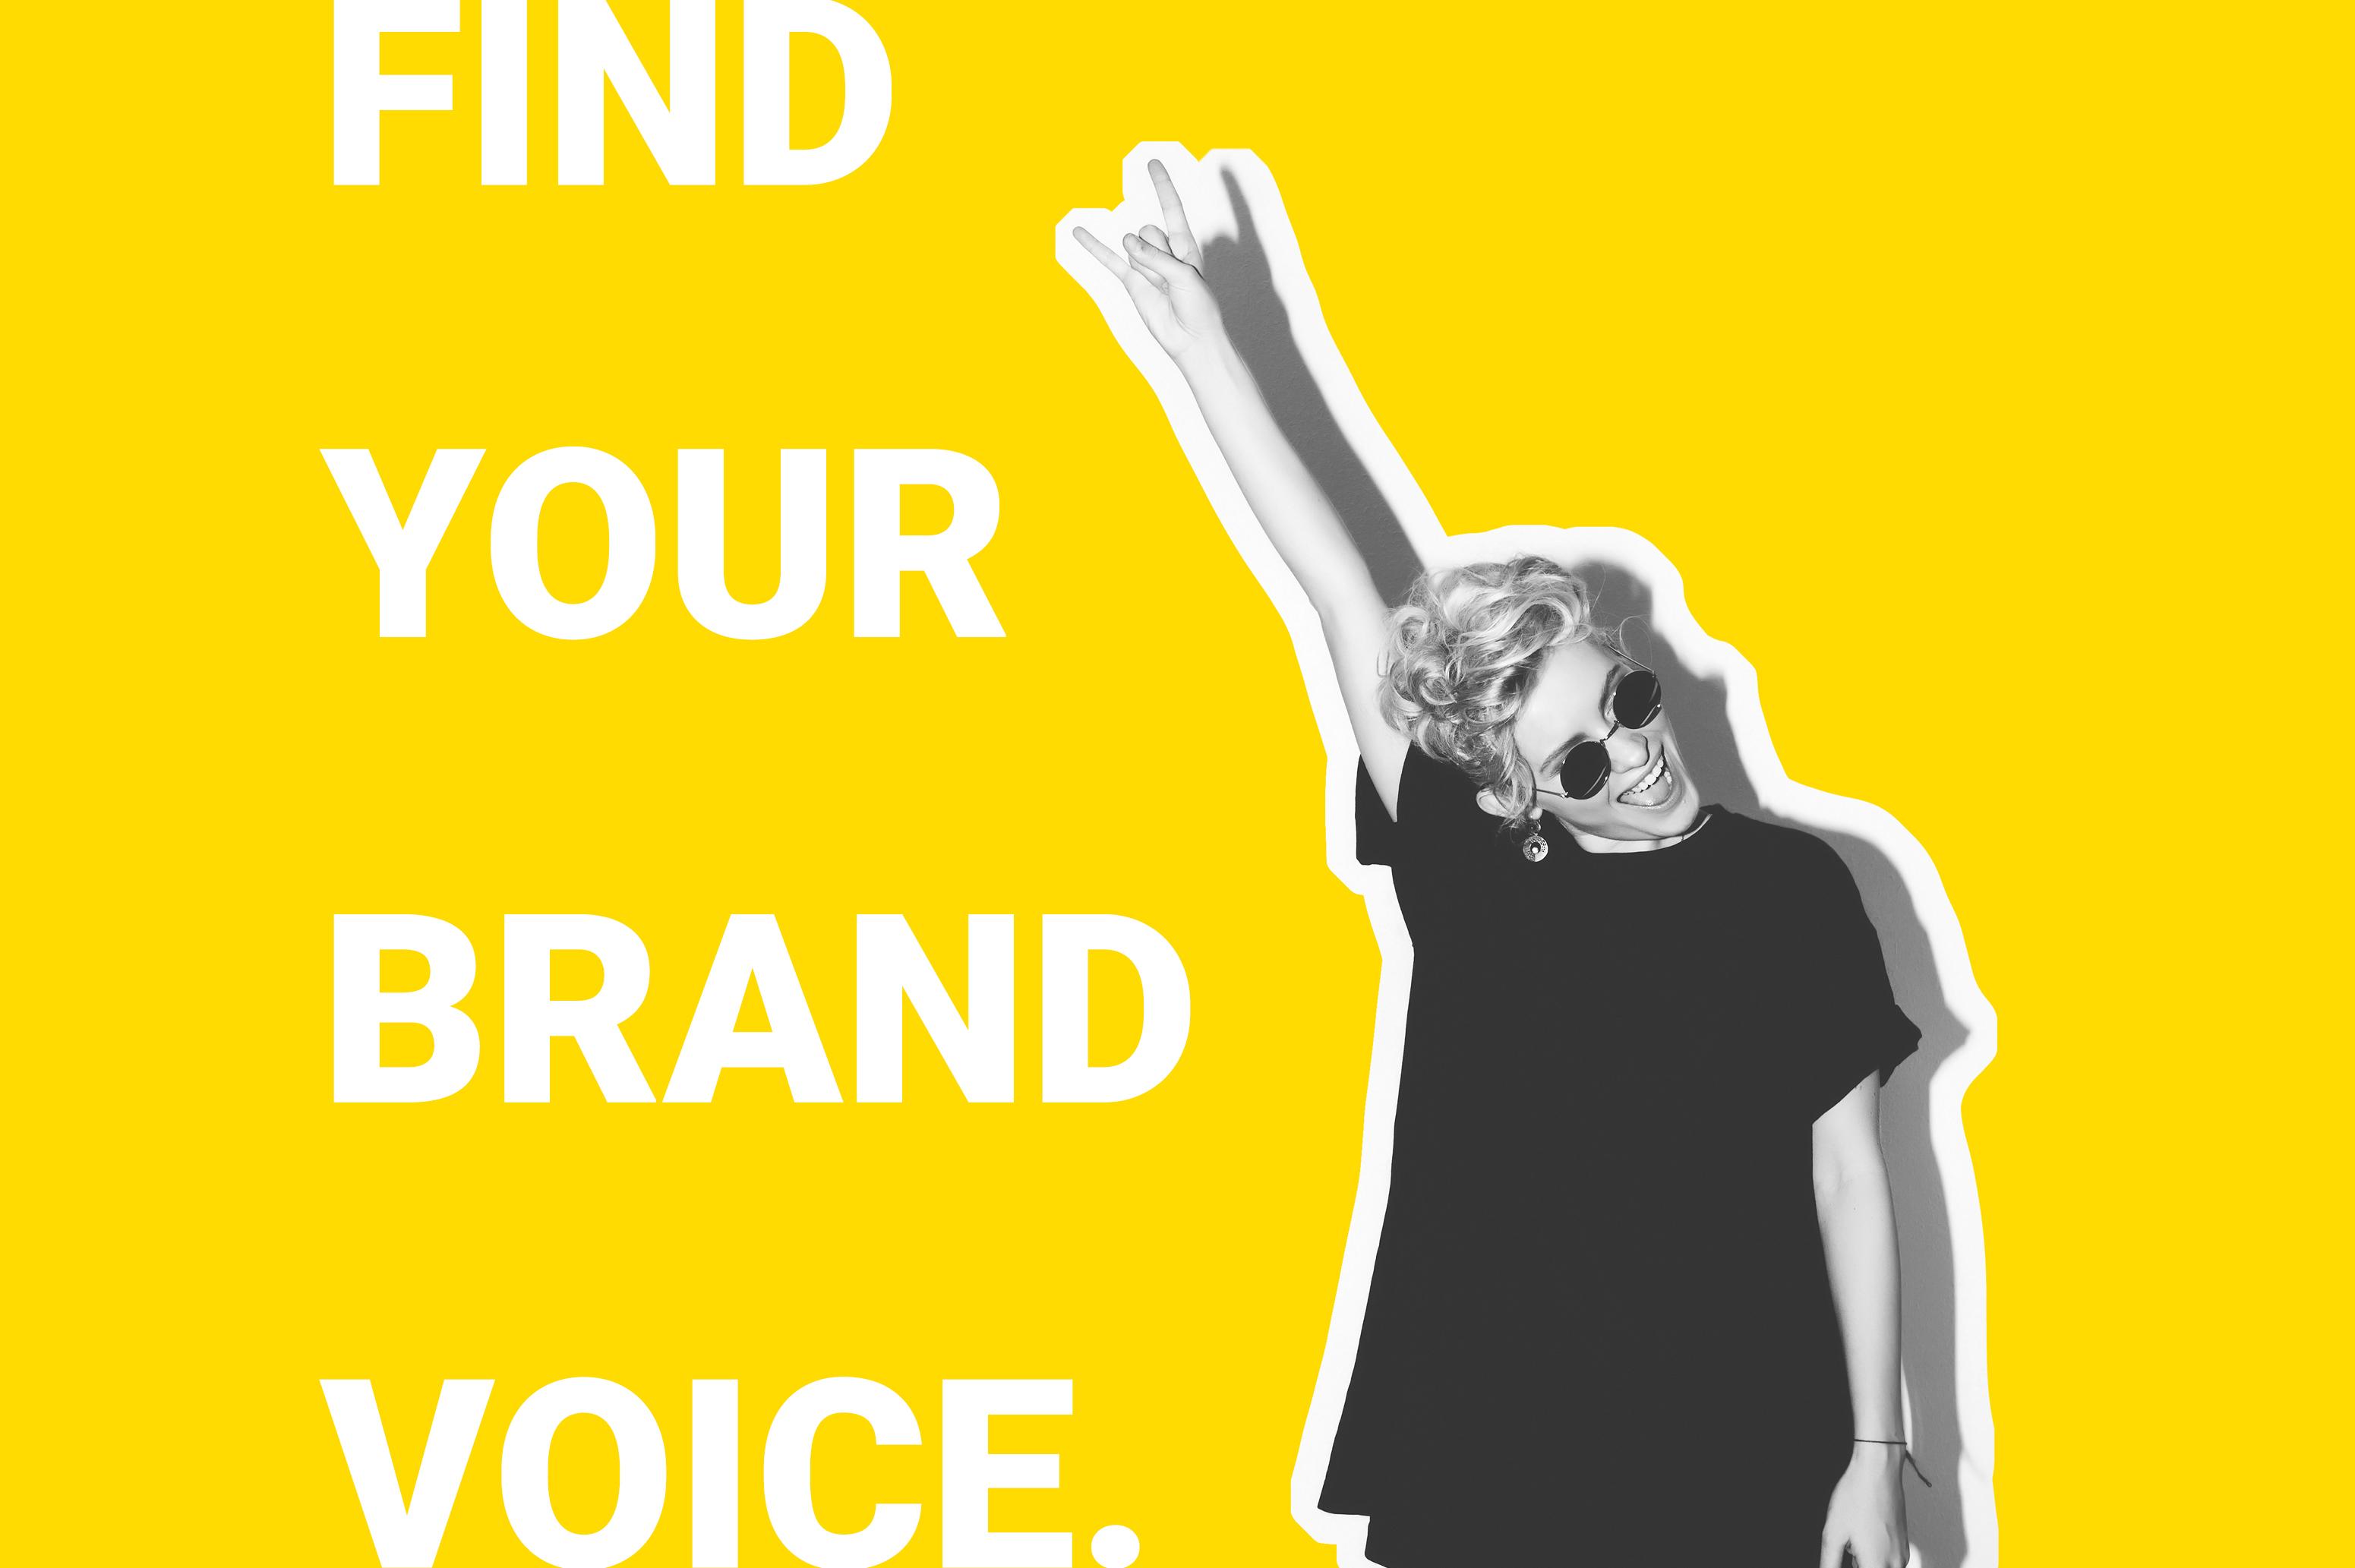 find your brand voice meme